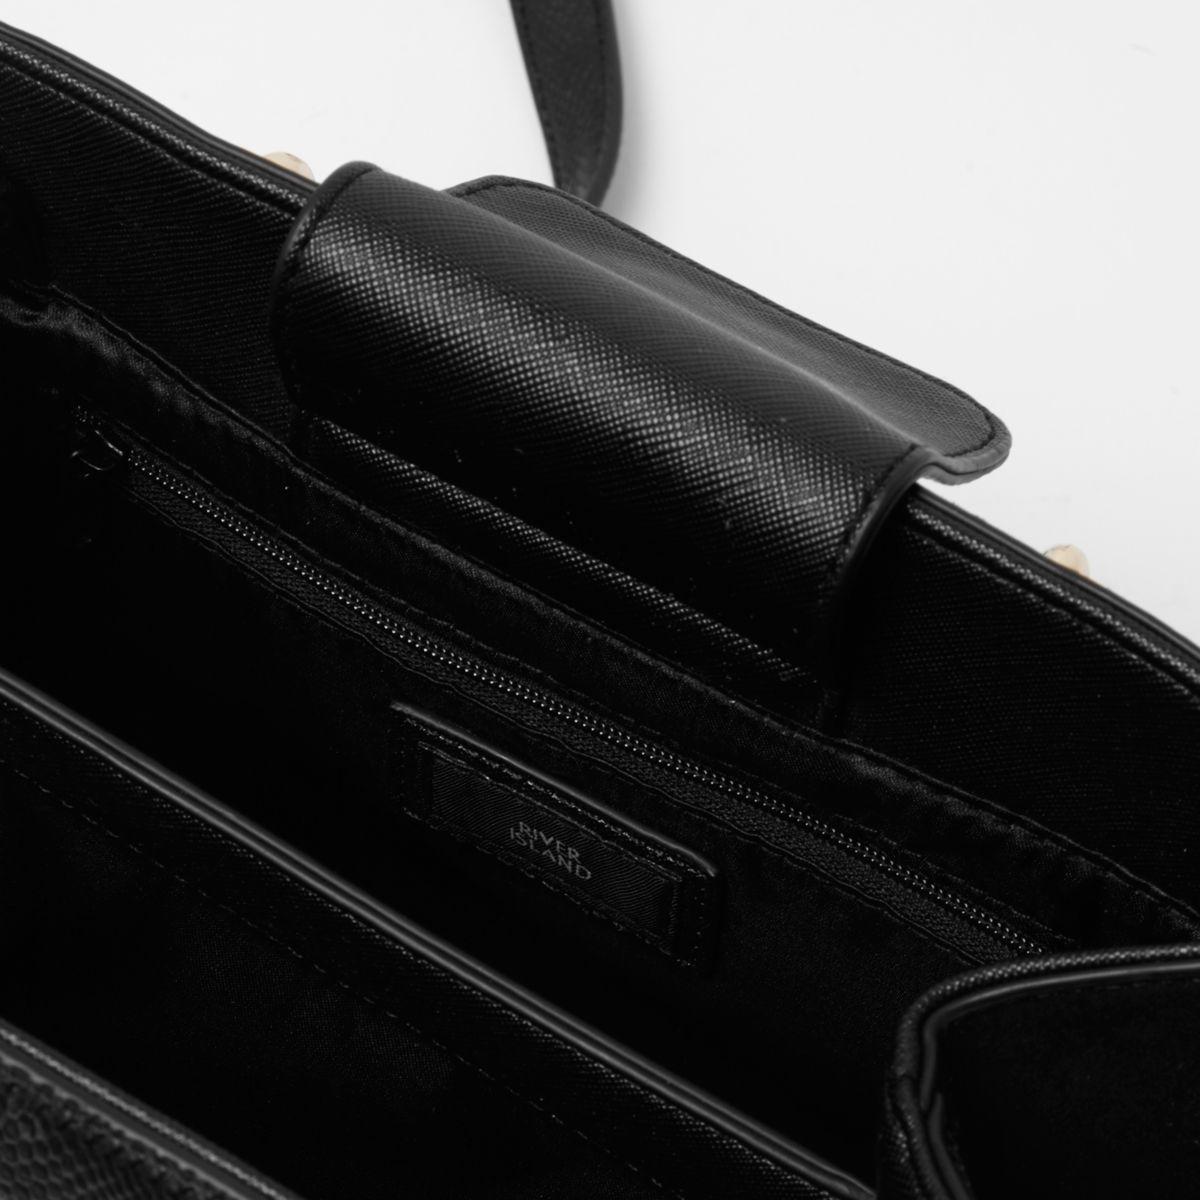 River Island Black Studded Metal Handle Tote Bag Black Studded Metal Handle Tote Bag